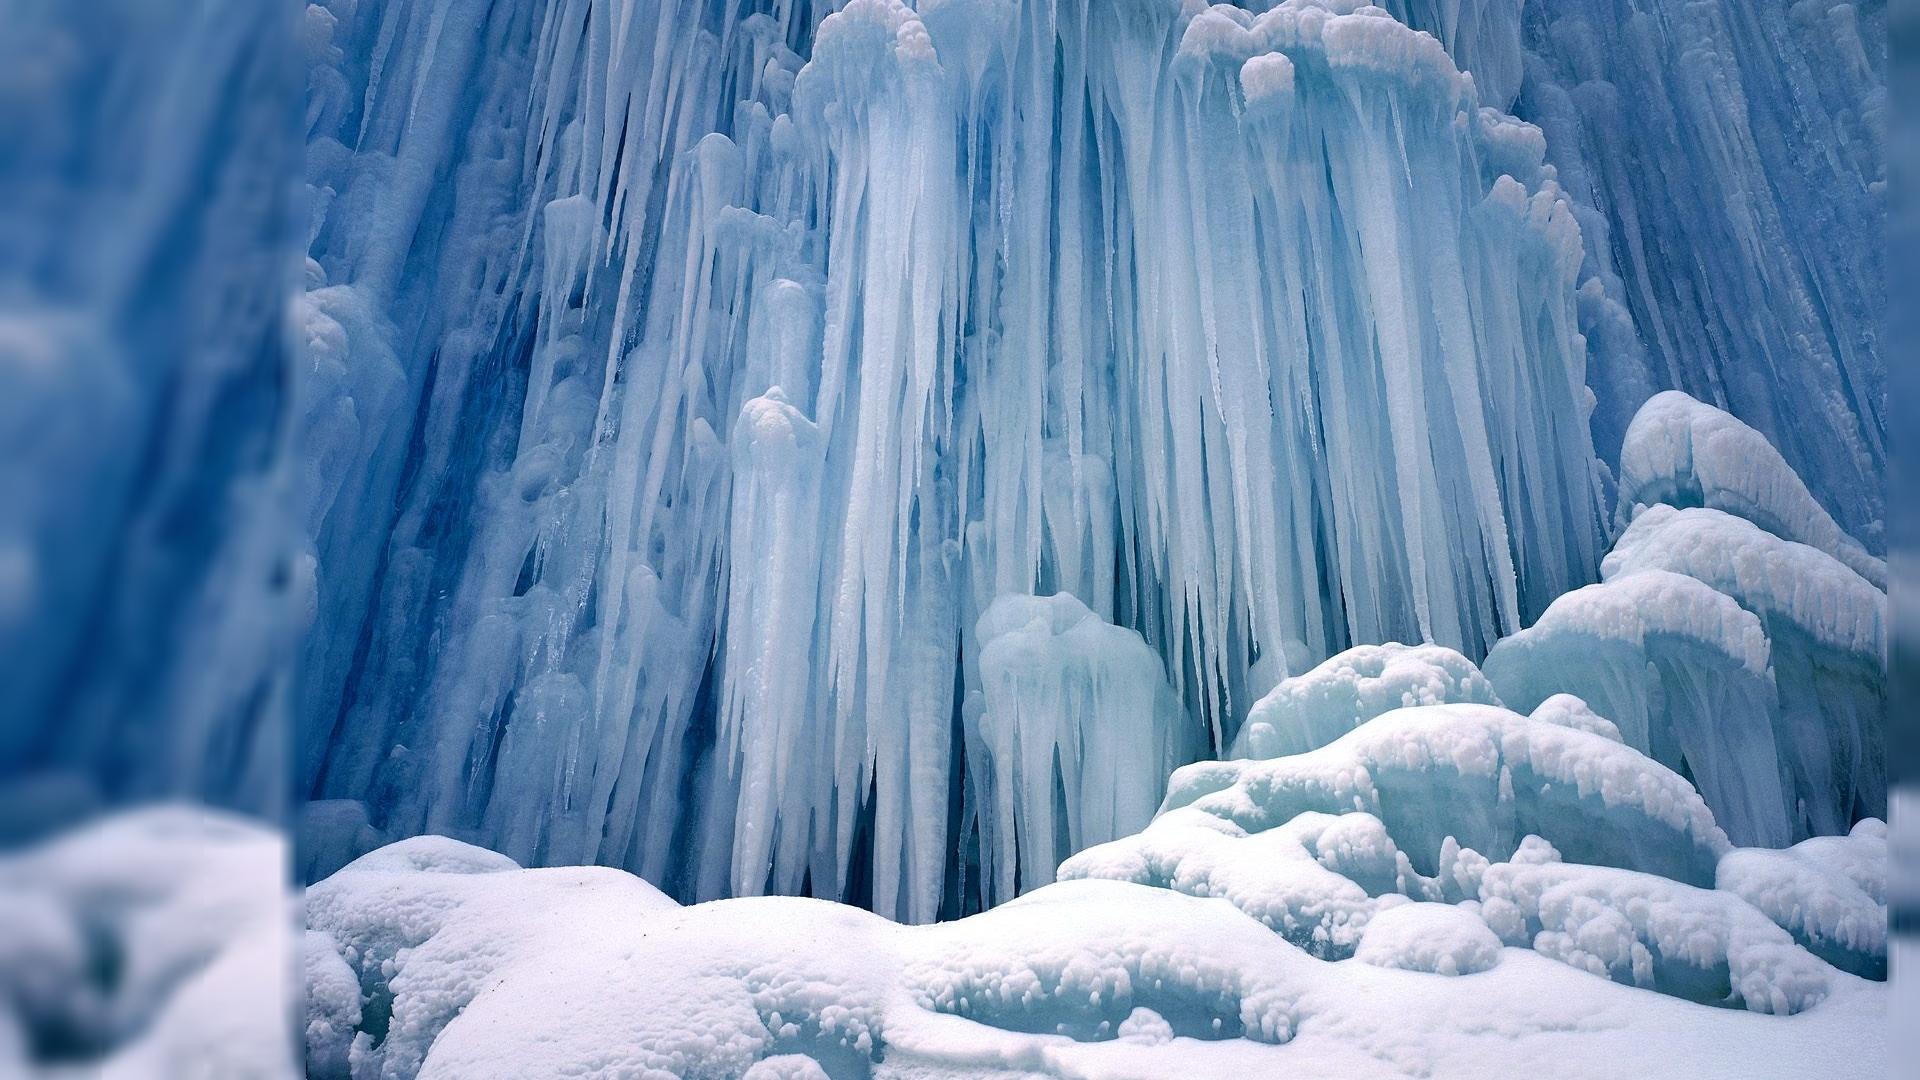 free desktop winter wallpaper which is under the winter wallpapers 1920x1080